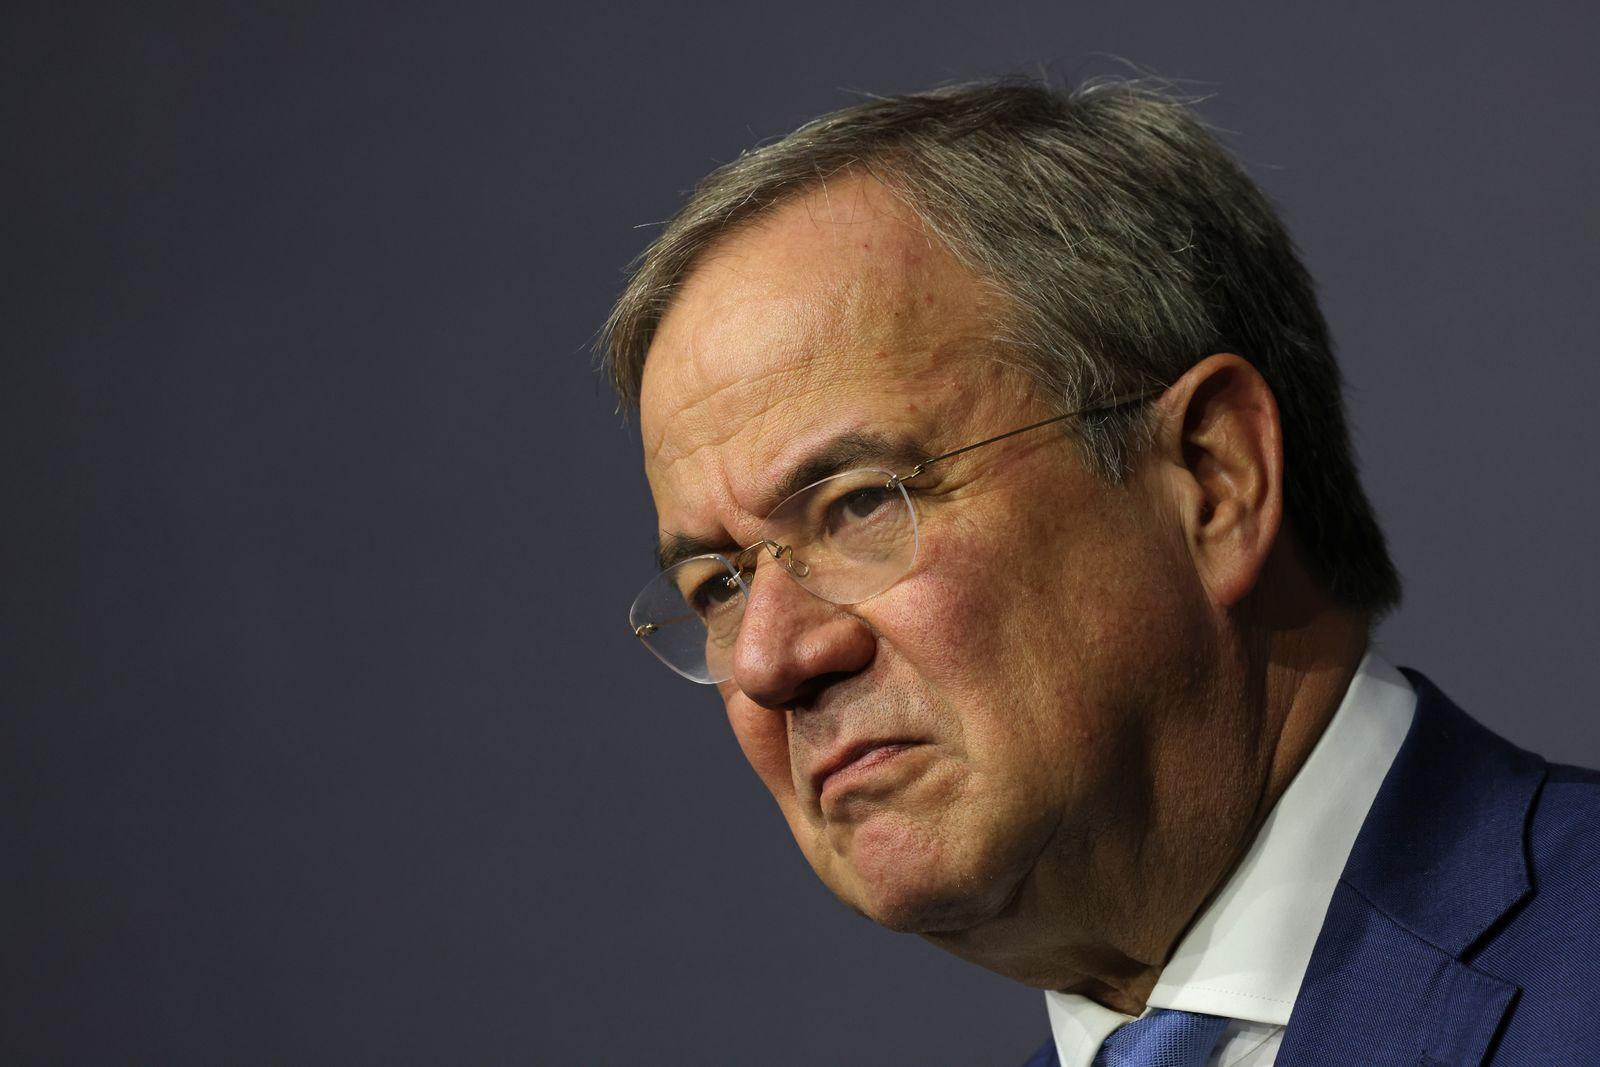 Christian Democrats And Greens Meet For Exploratory Coalition Talks